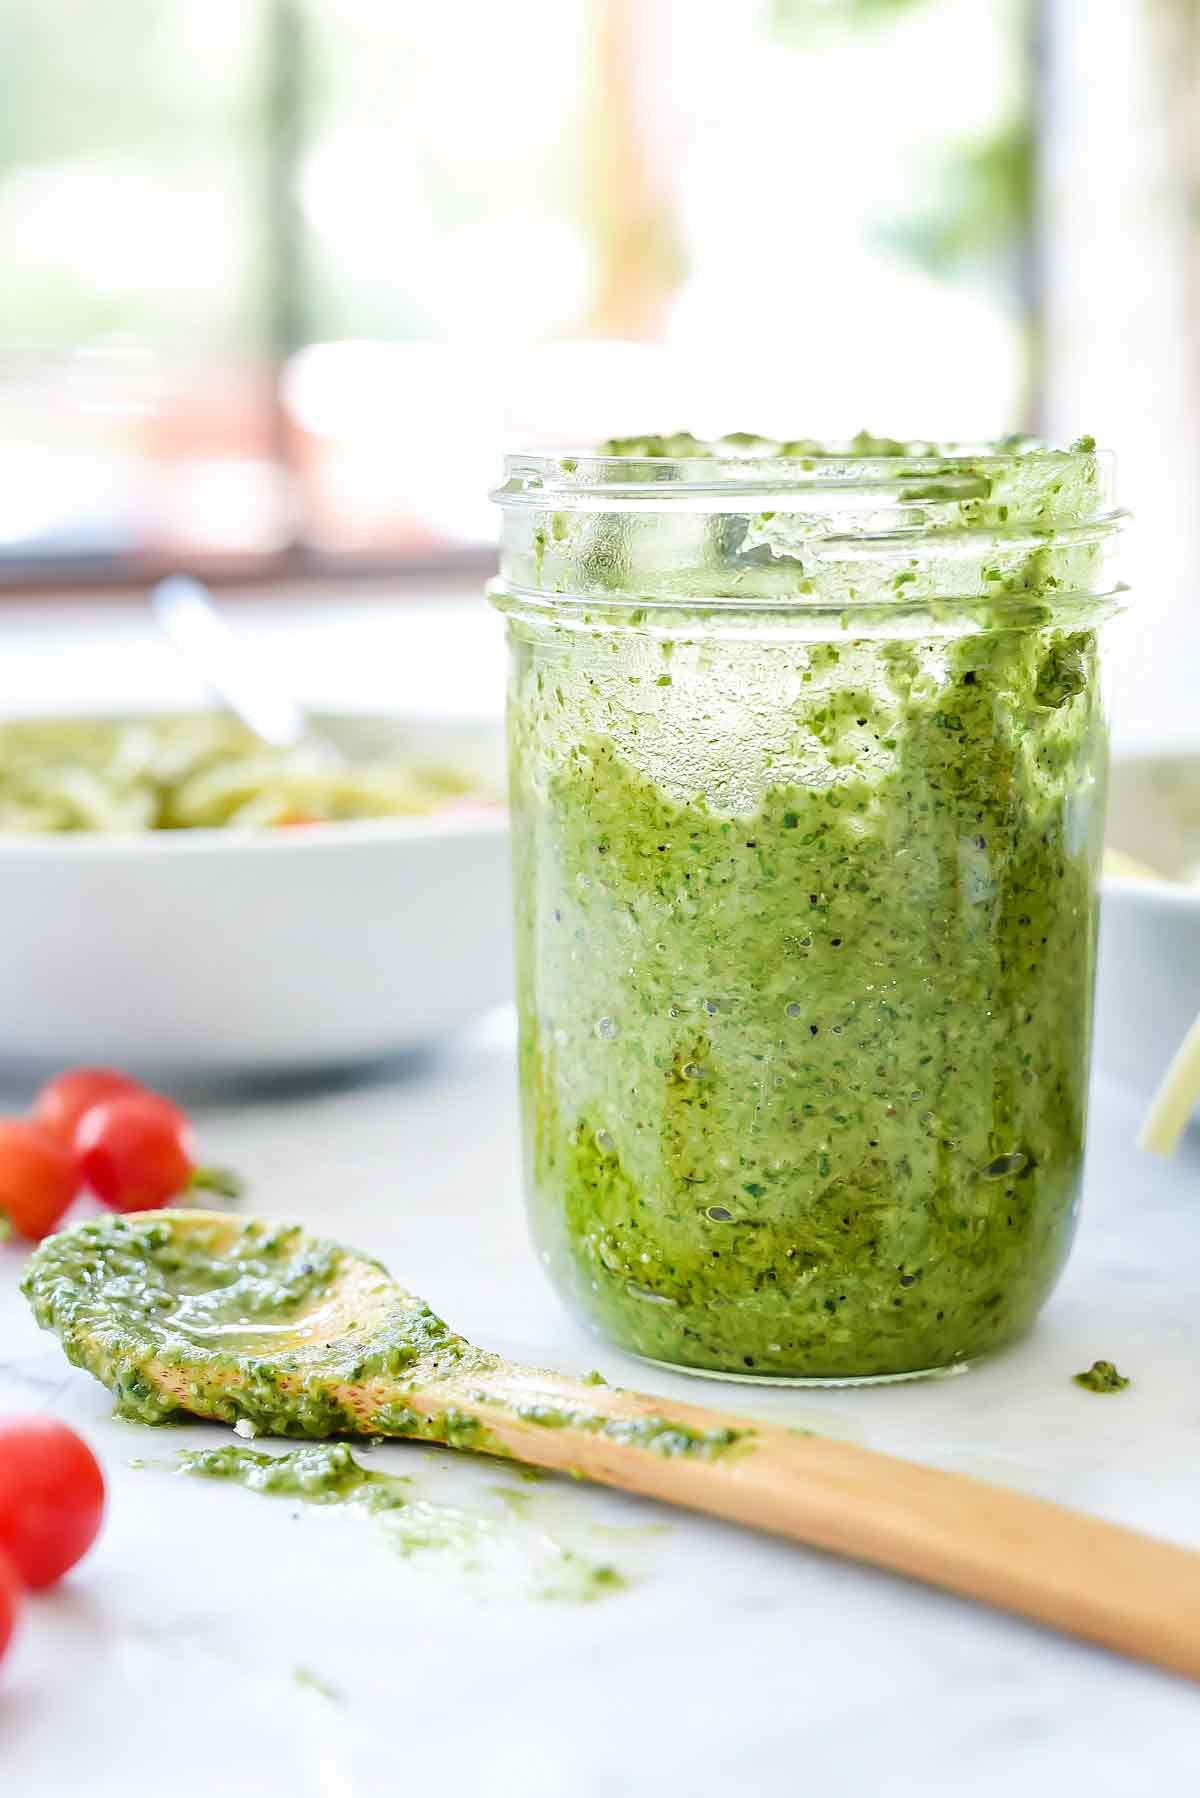 How To Make Pesto Sauce  Easy Homemade Pesto Pasta Recipe